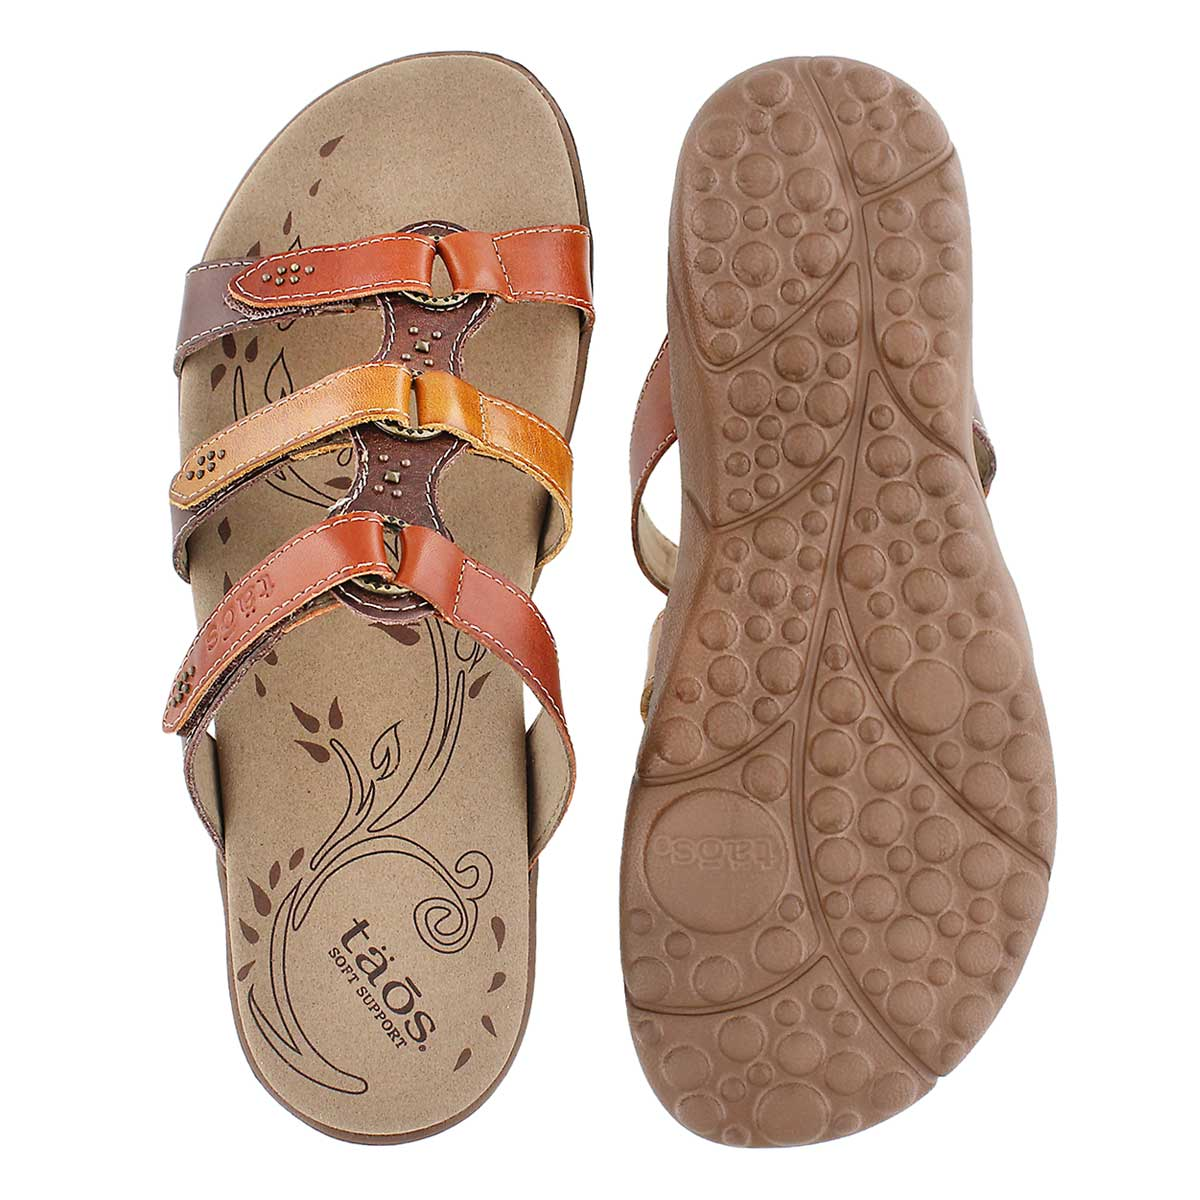 Sandale Tribute, orange/multi, femmes